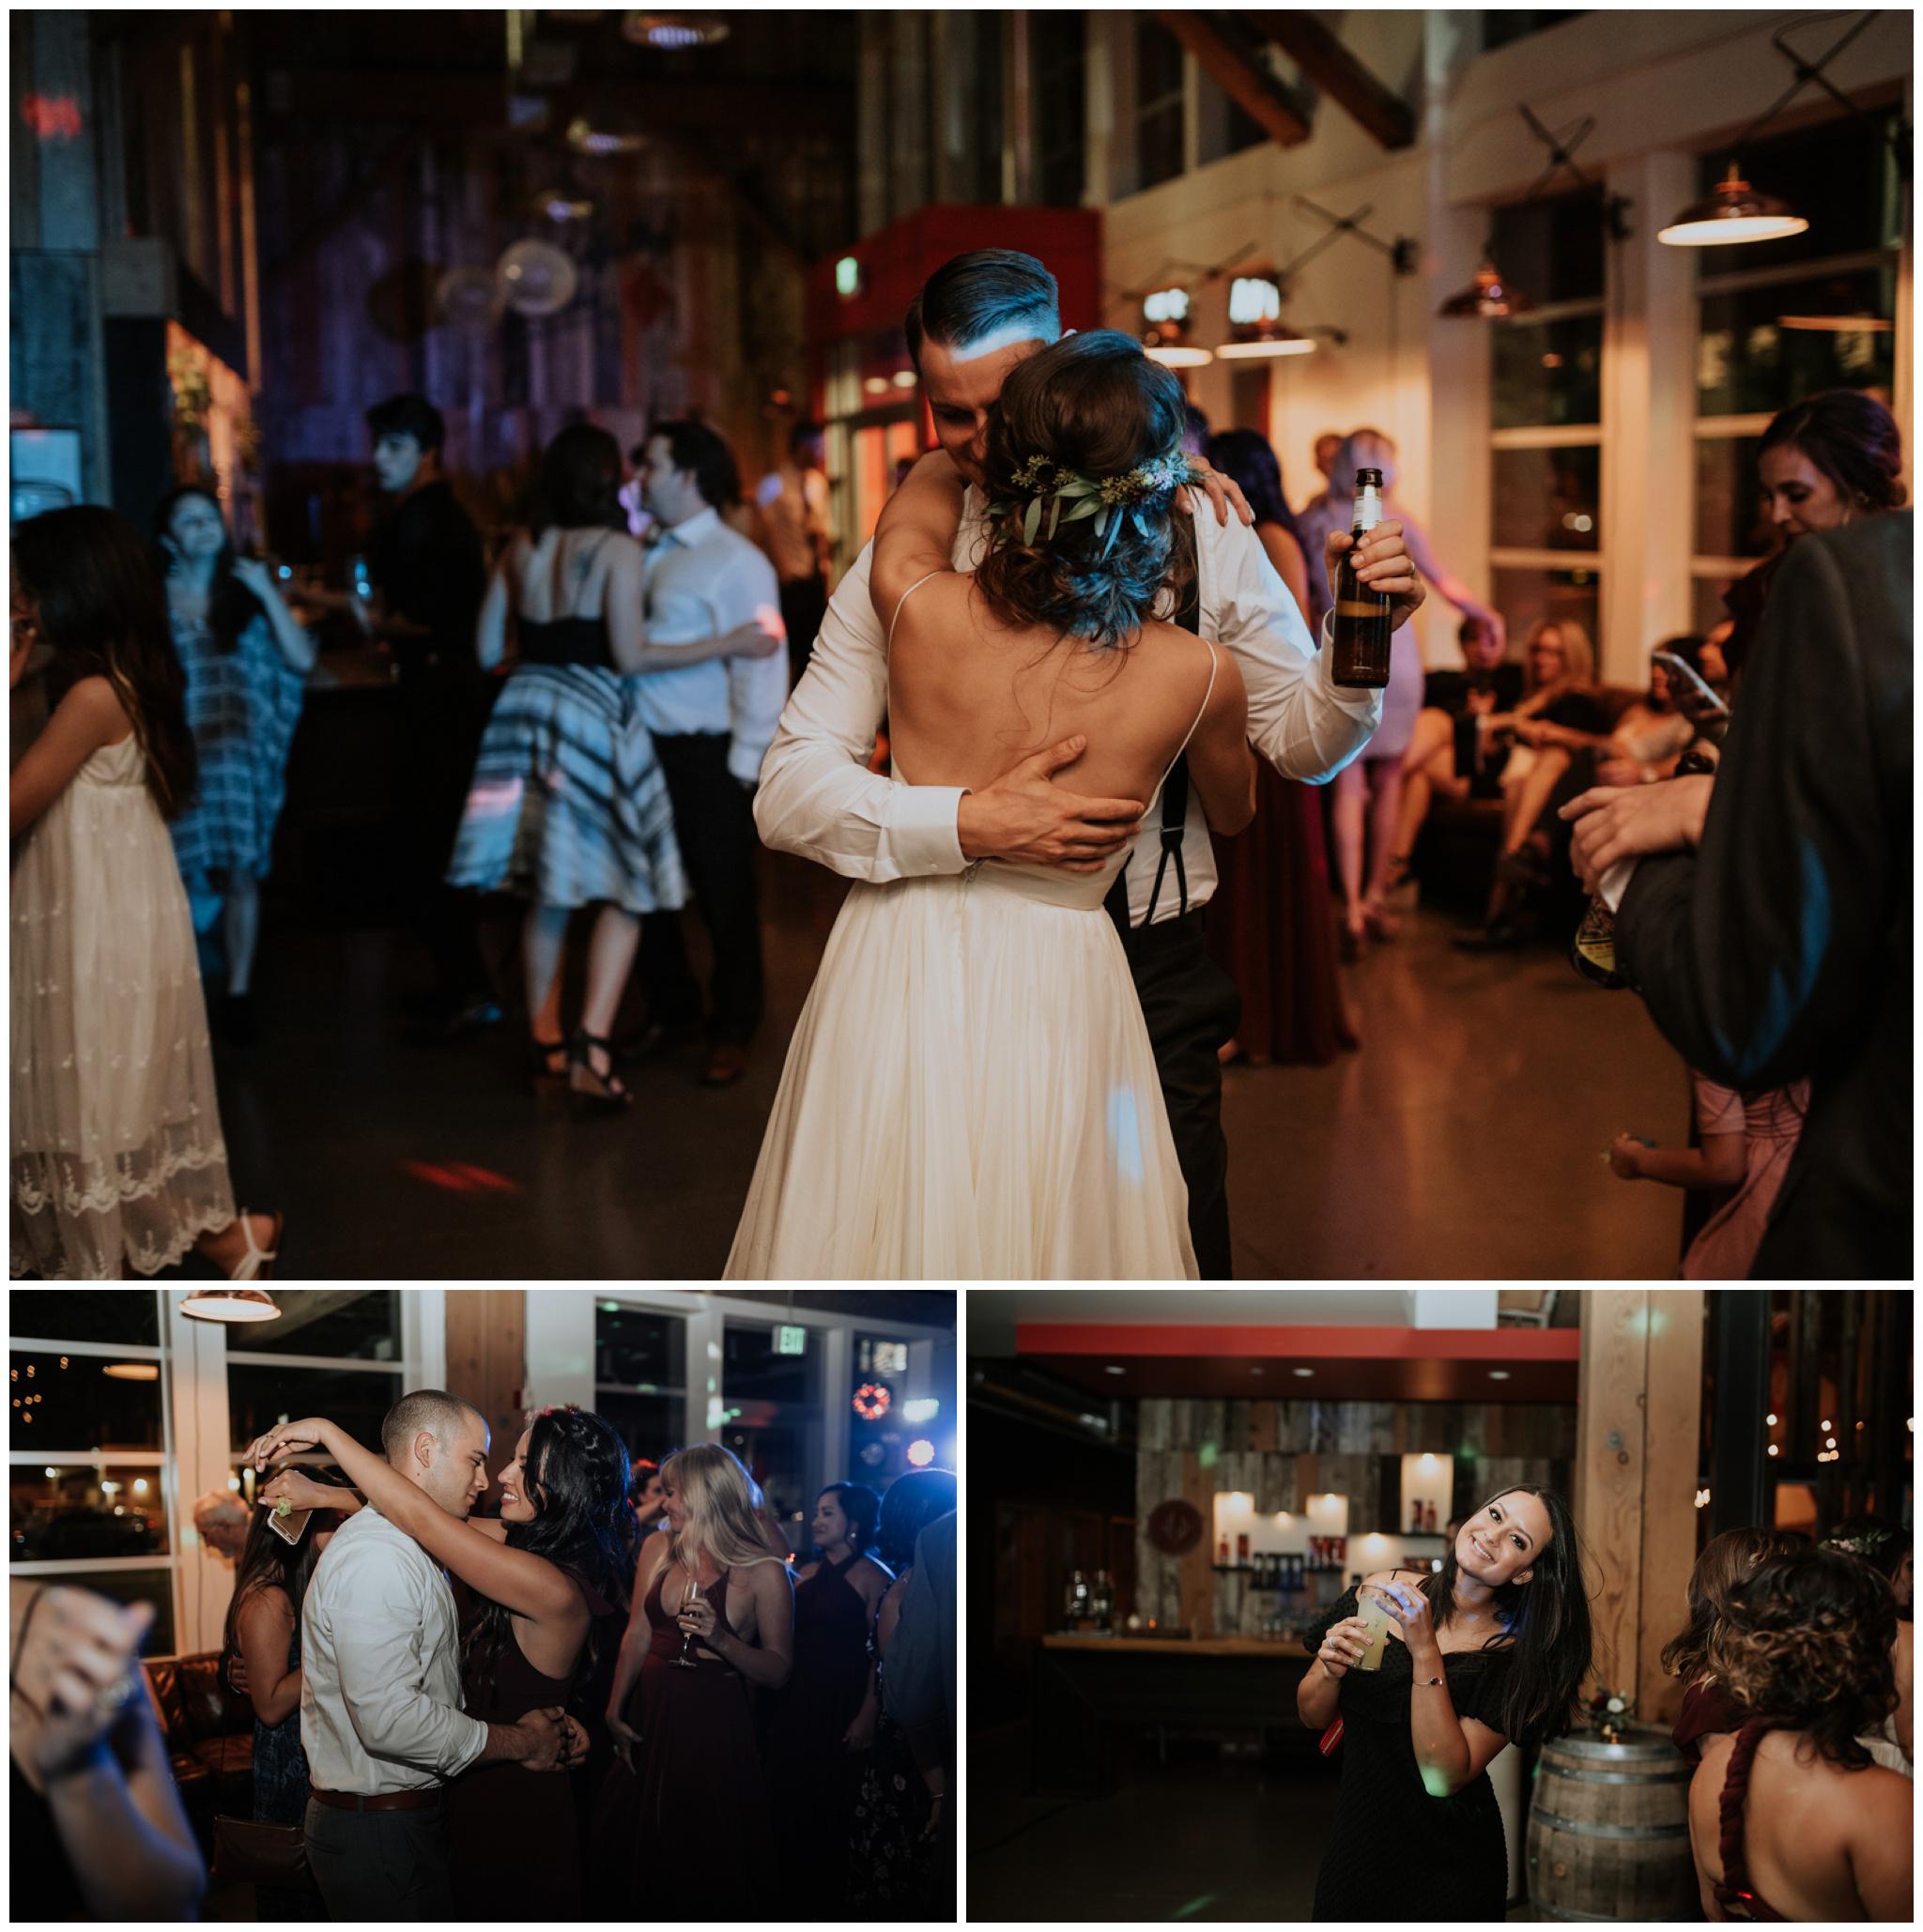 alyssa-keiran-westland-distillery-urban-seattle-wedding-photographer-caitlyn-nikula-160.jpg